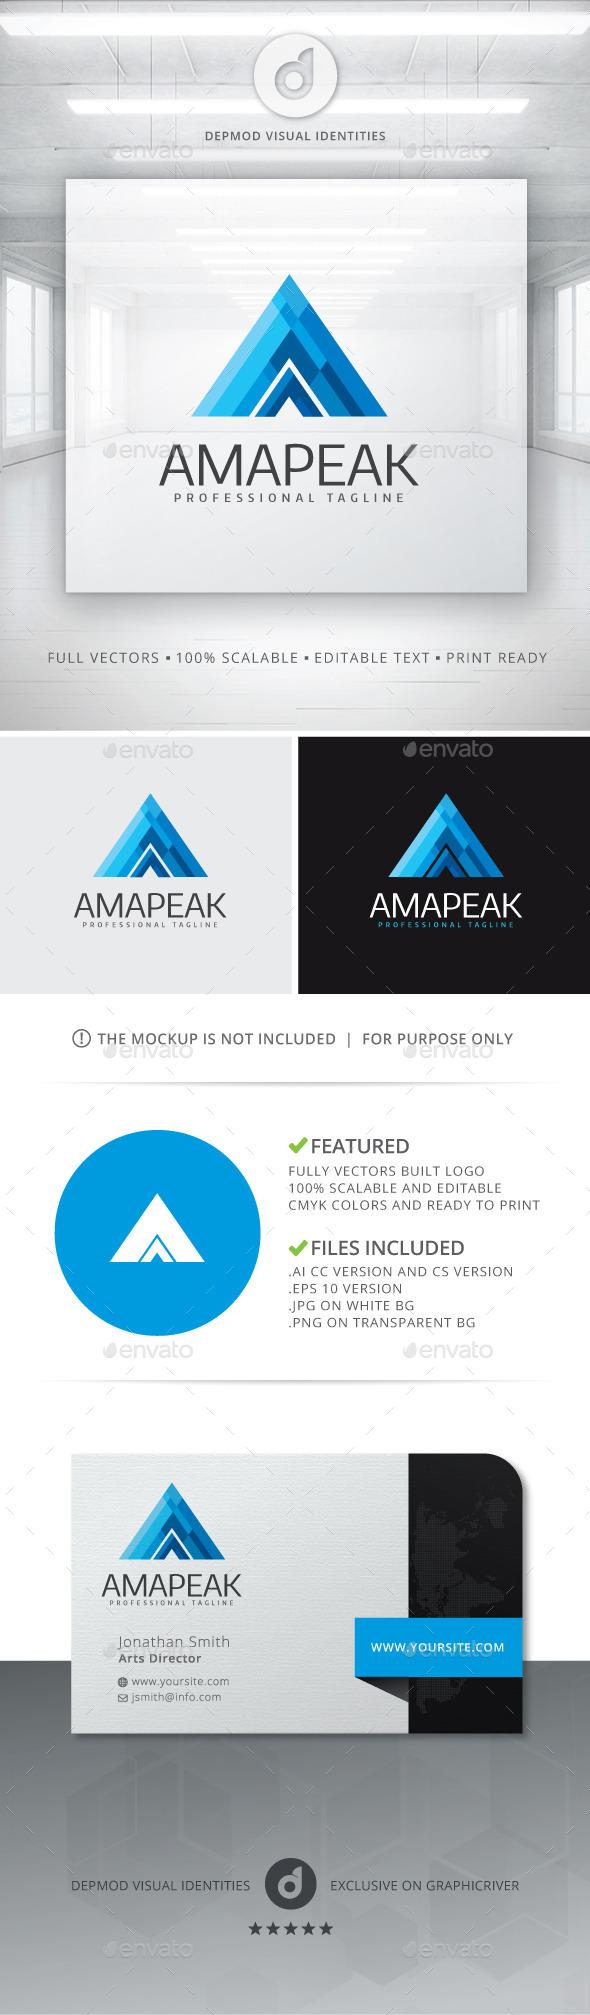 GraphicRiver Amapeak Logo 10966553